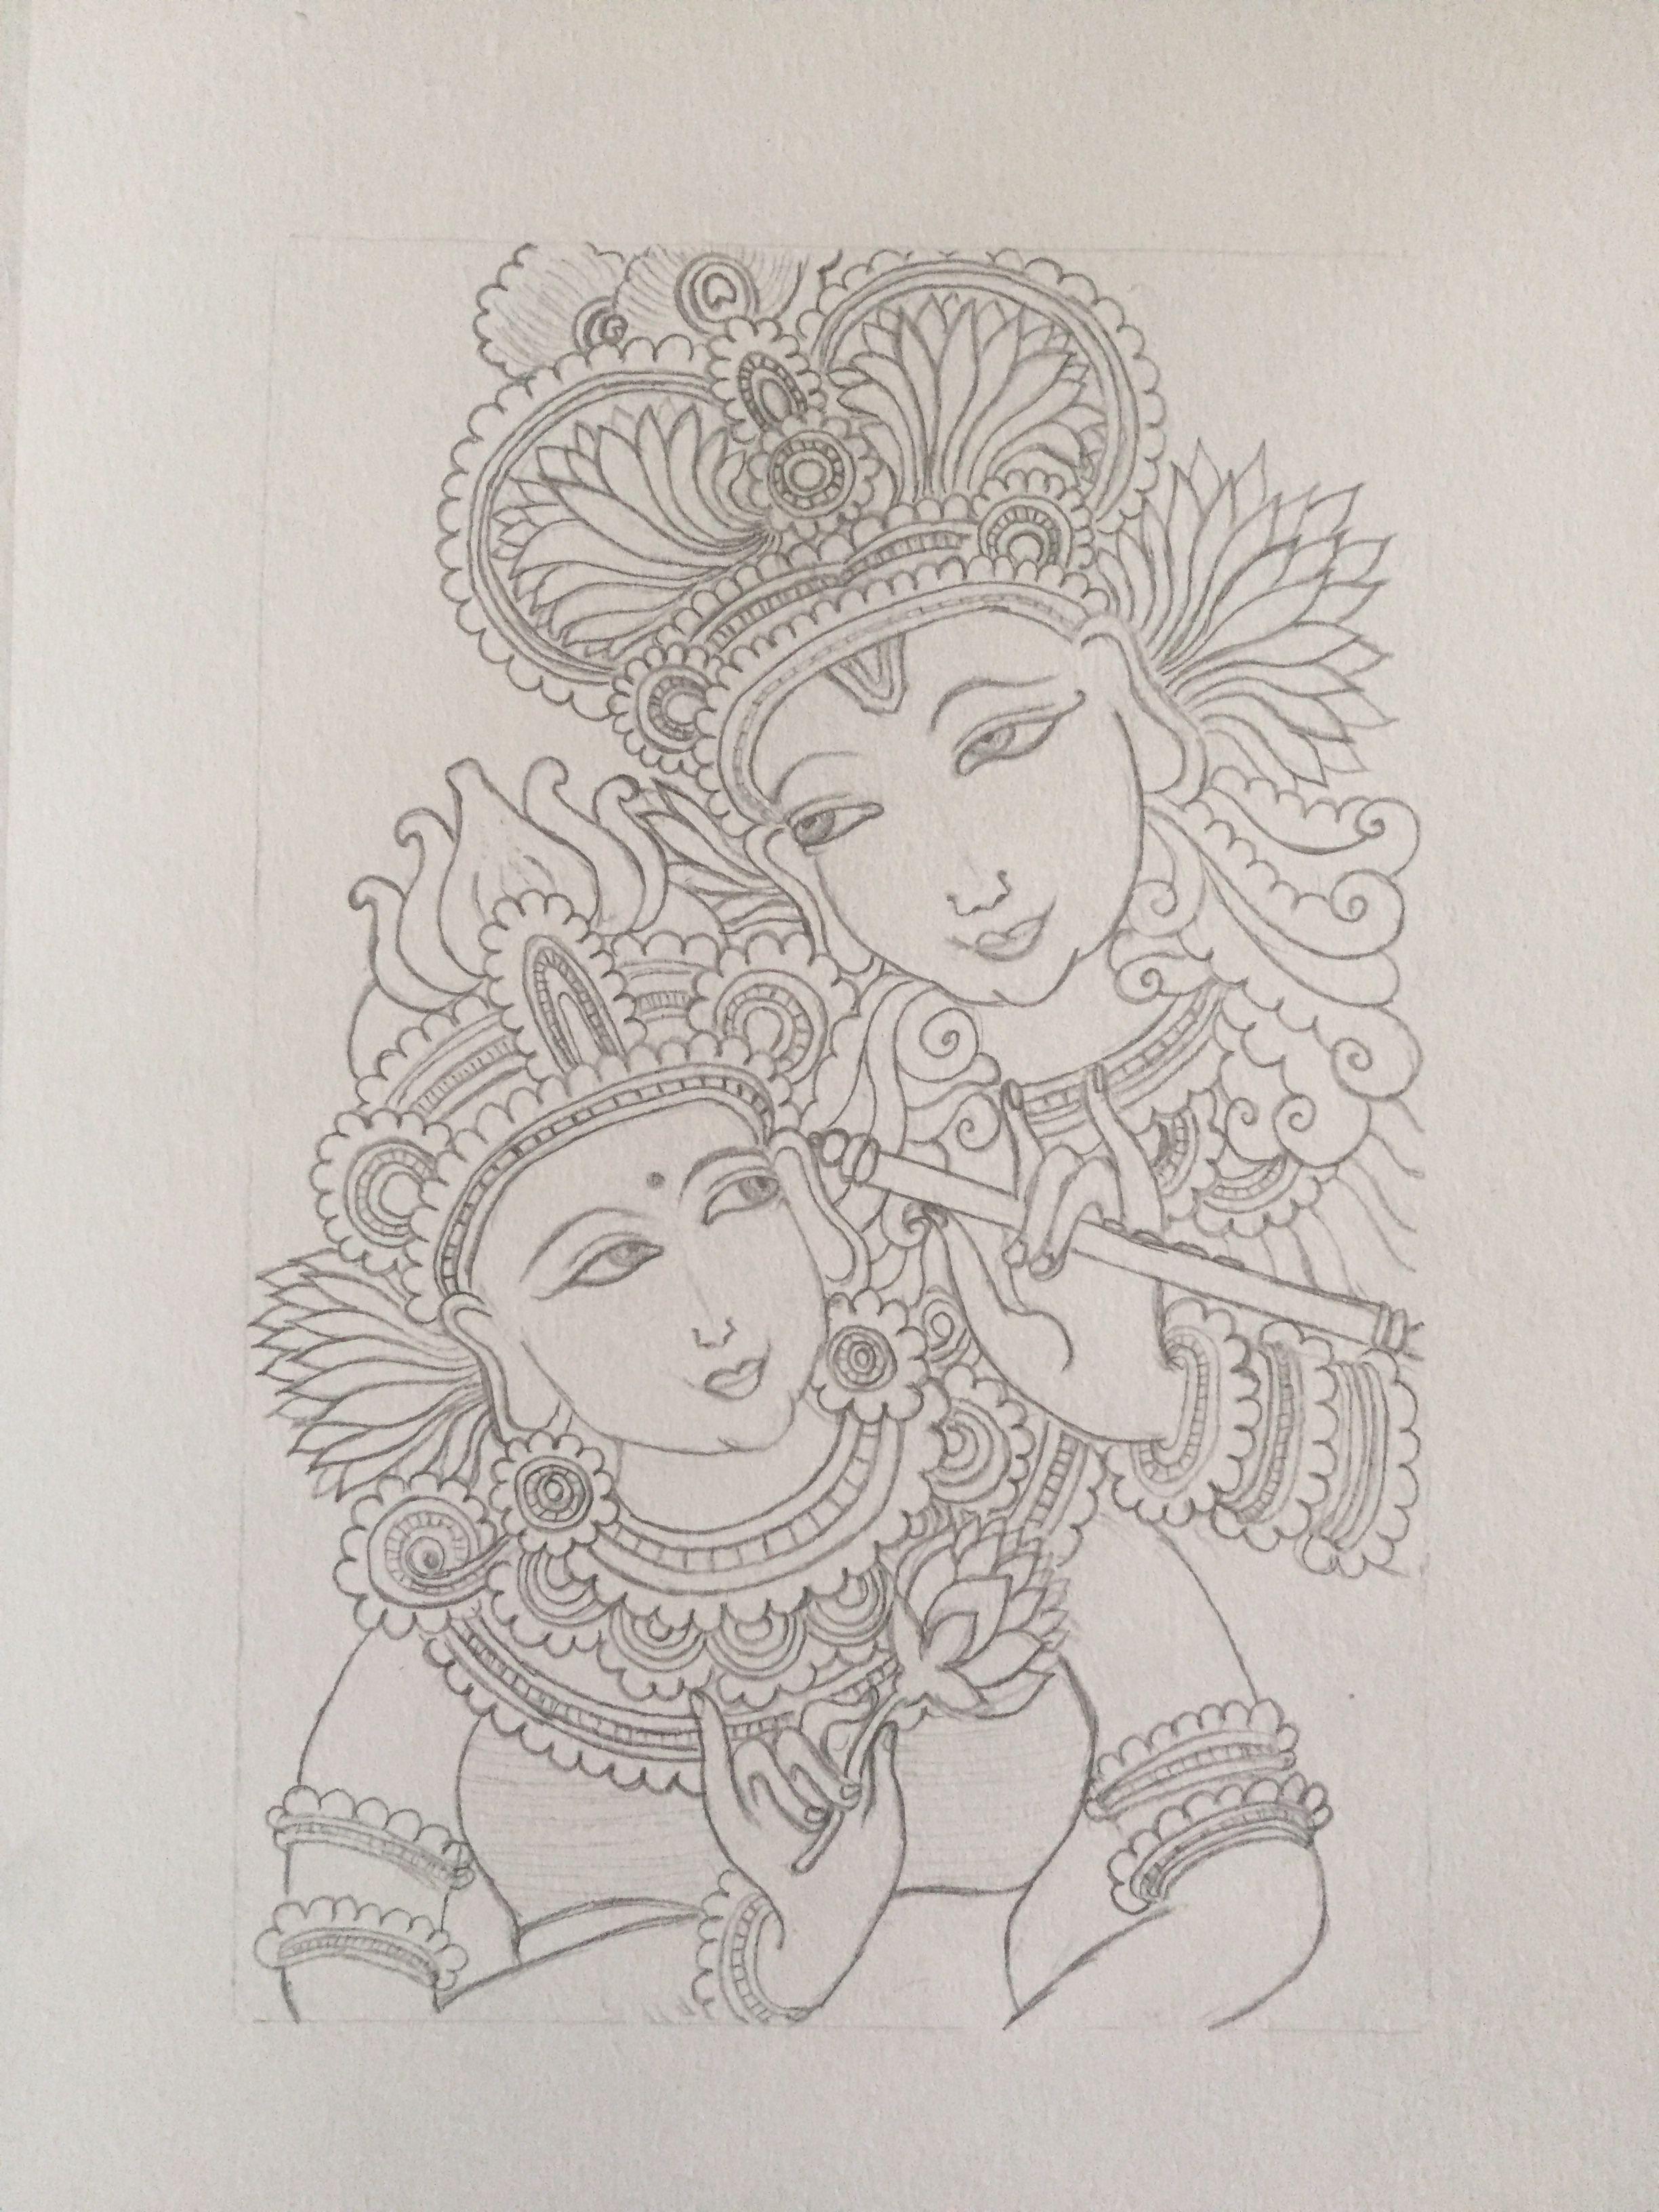 Pencil drawing of krishna radha kerala mural painting style